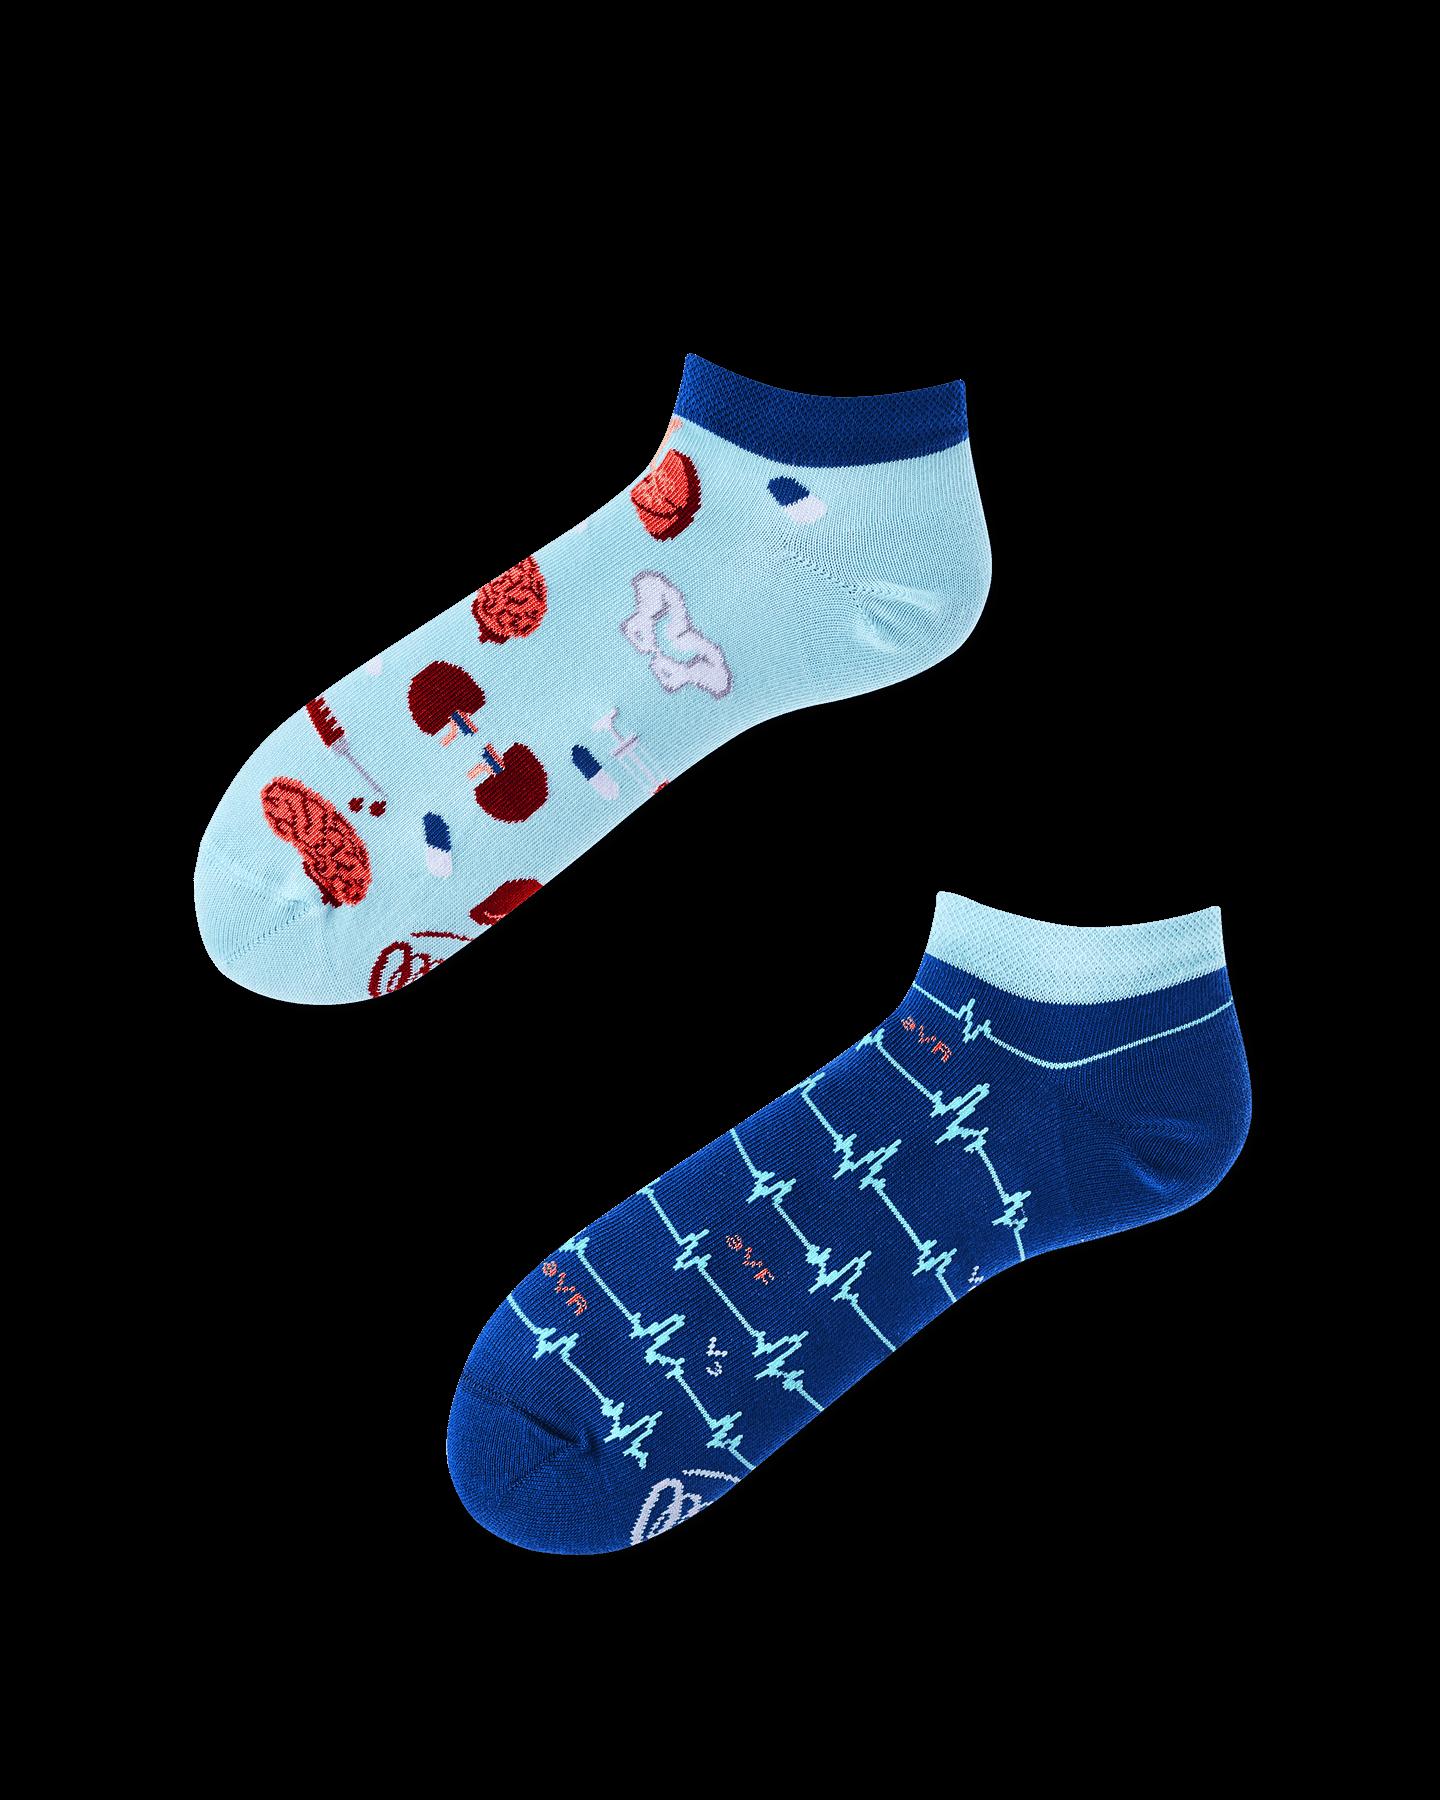 DR.SOCK LOW - Doctor low socks